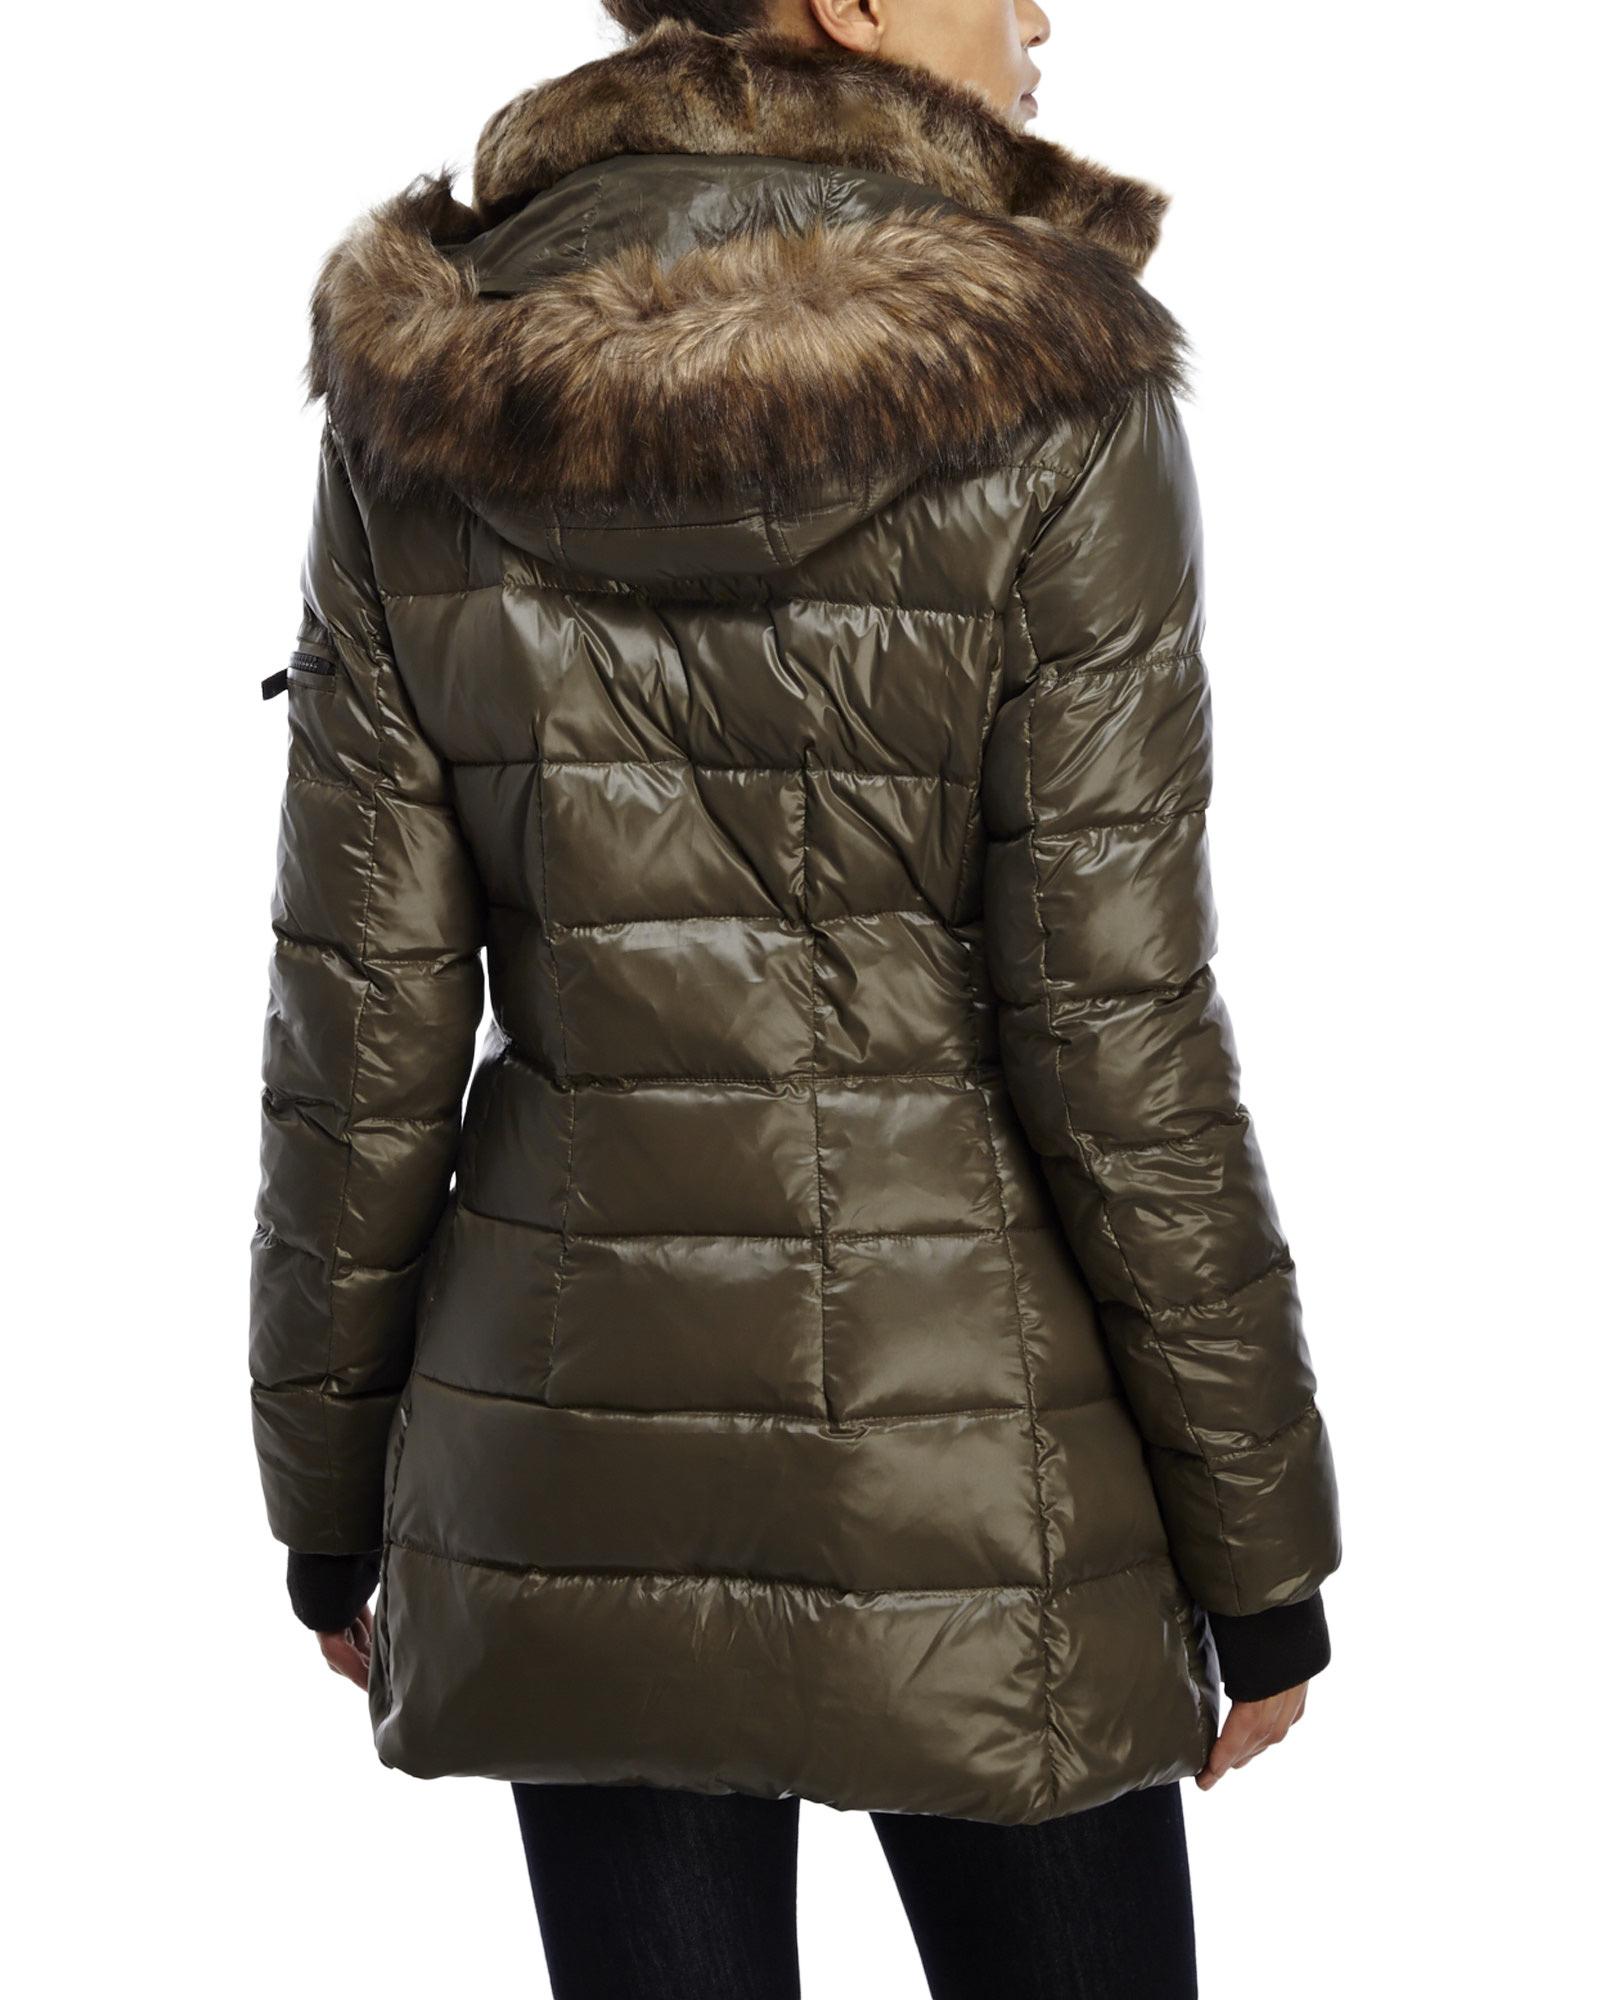 66b92ce51 S13/nyc Brown Faux Fur Trim Down Puffer Coat